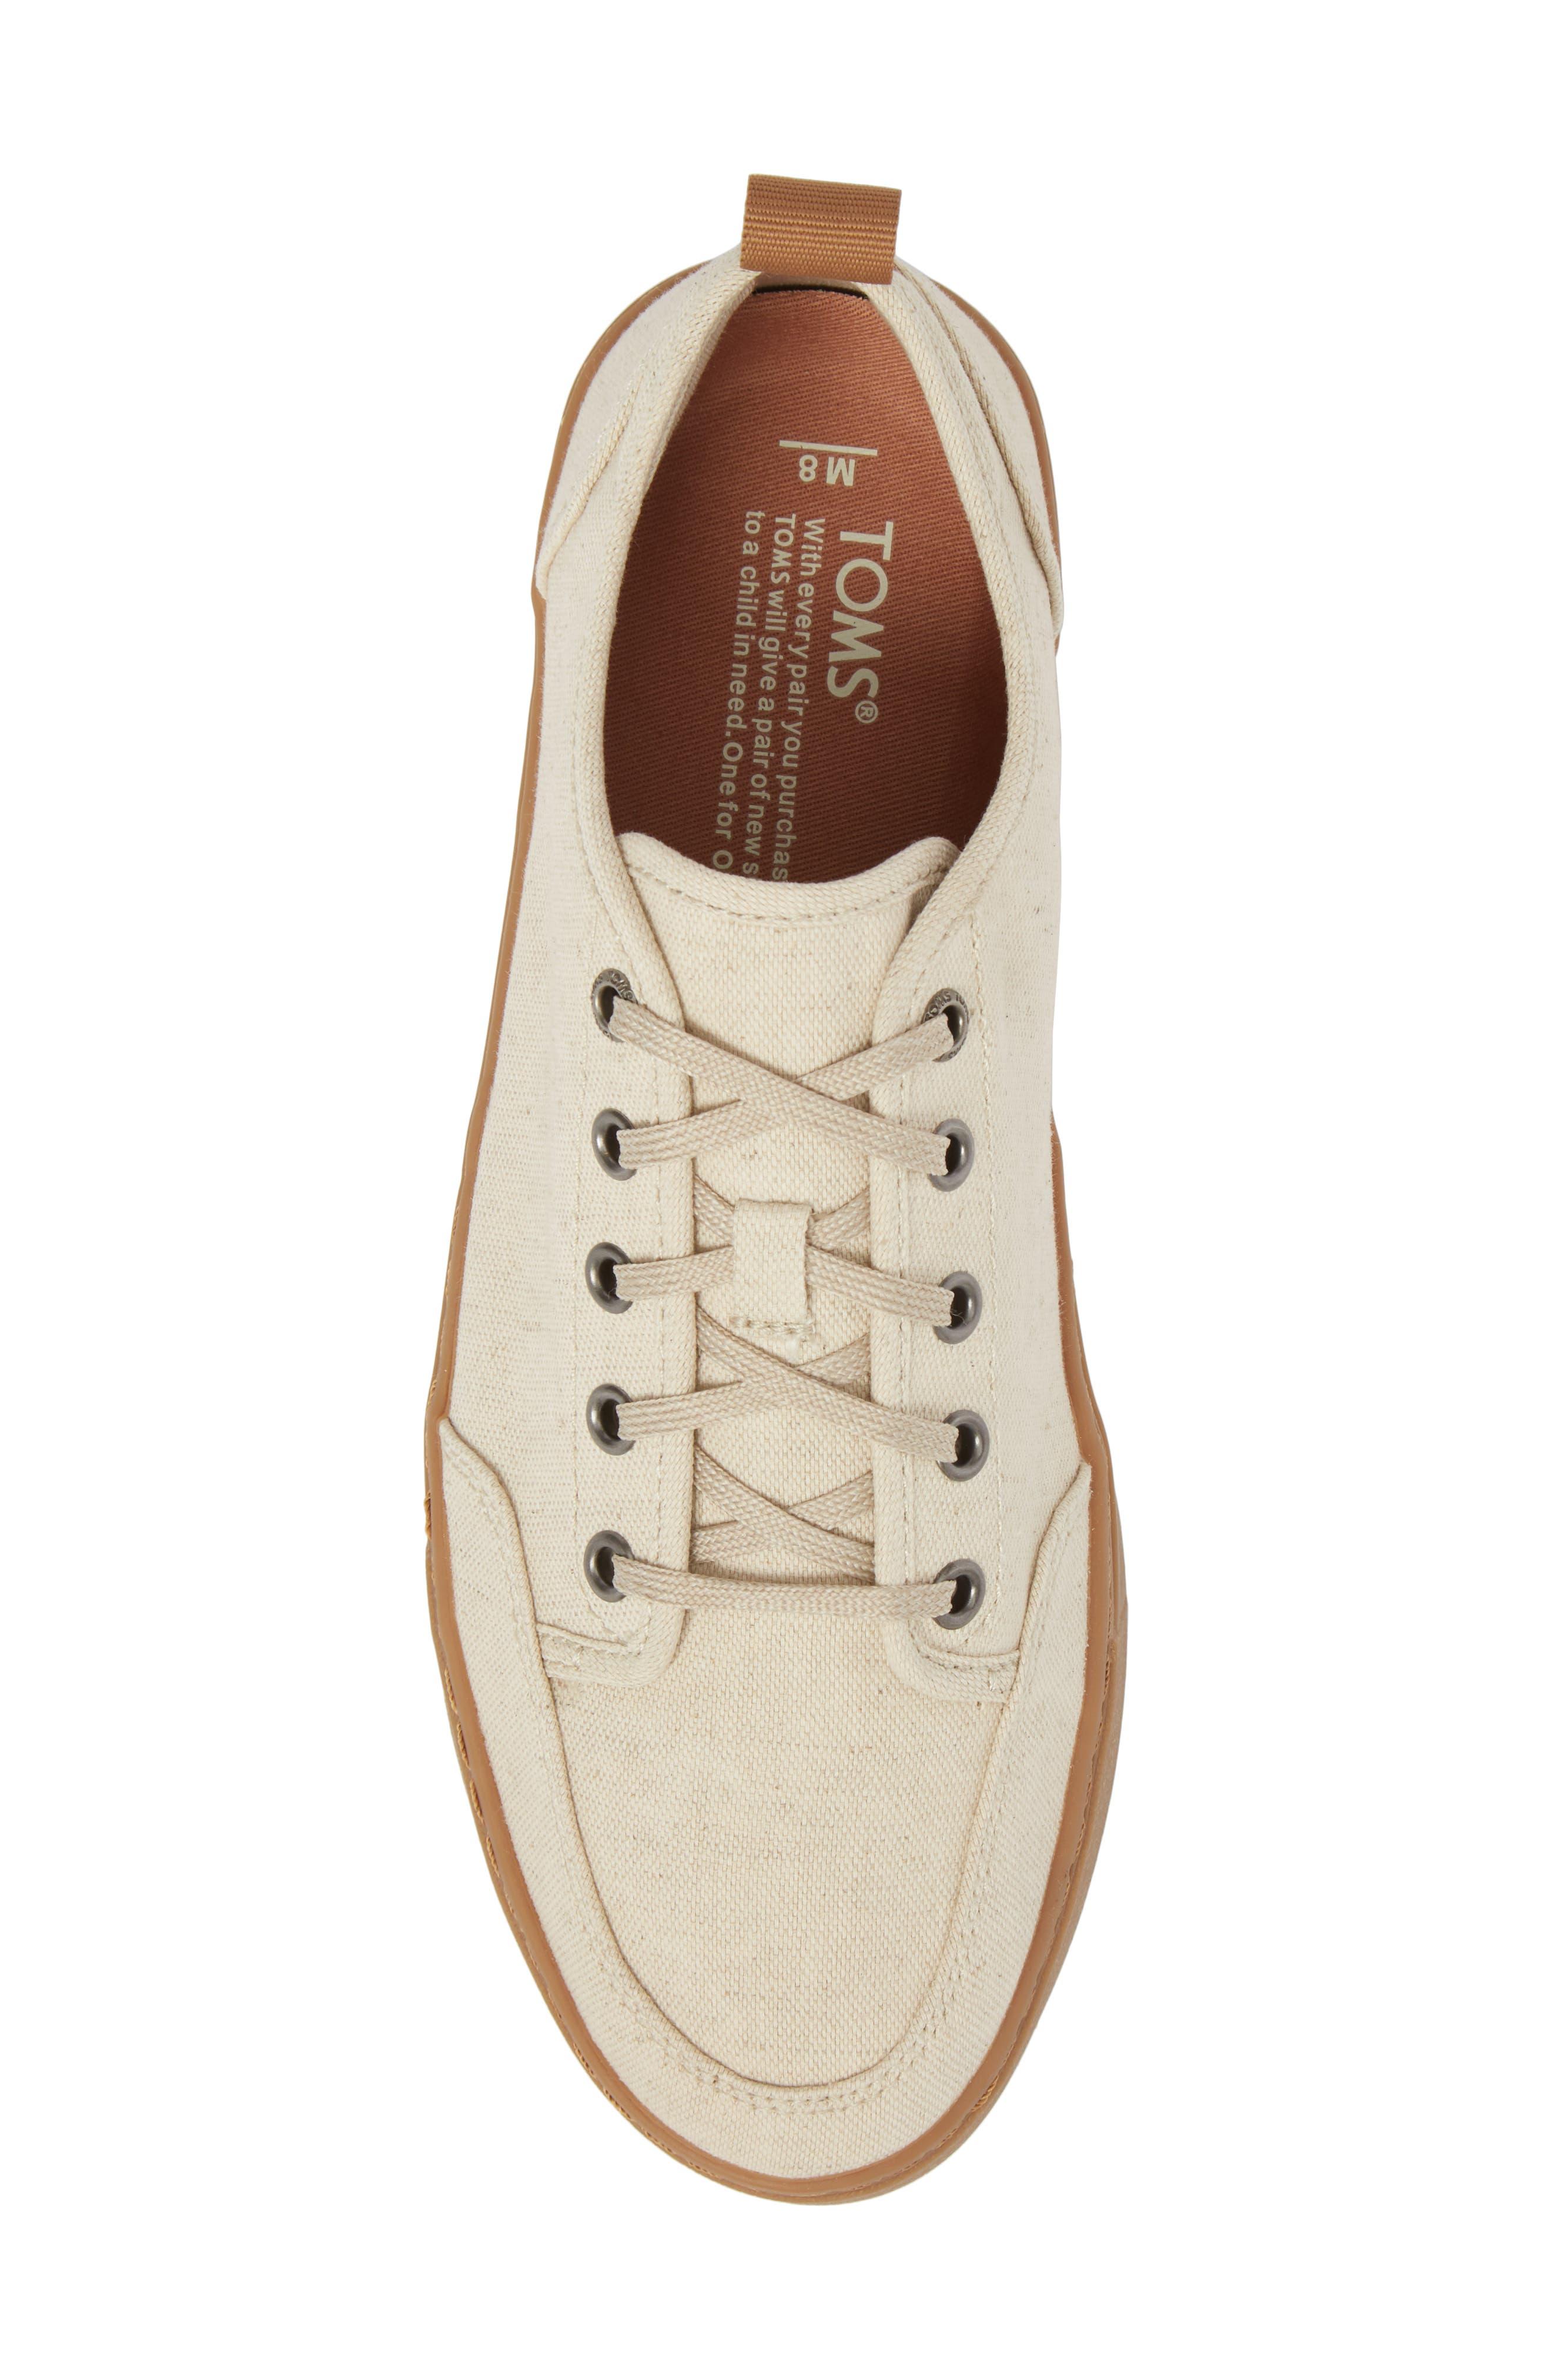 Landen Low Top Sneaker,                             Alternate thumbnail 5, color,                             NATURAL HEMP/ GUM